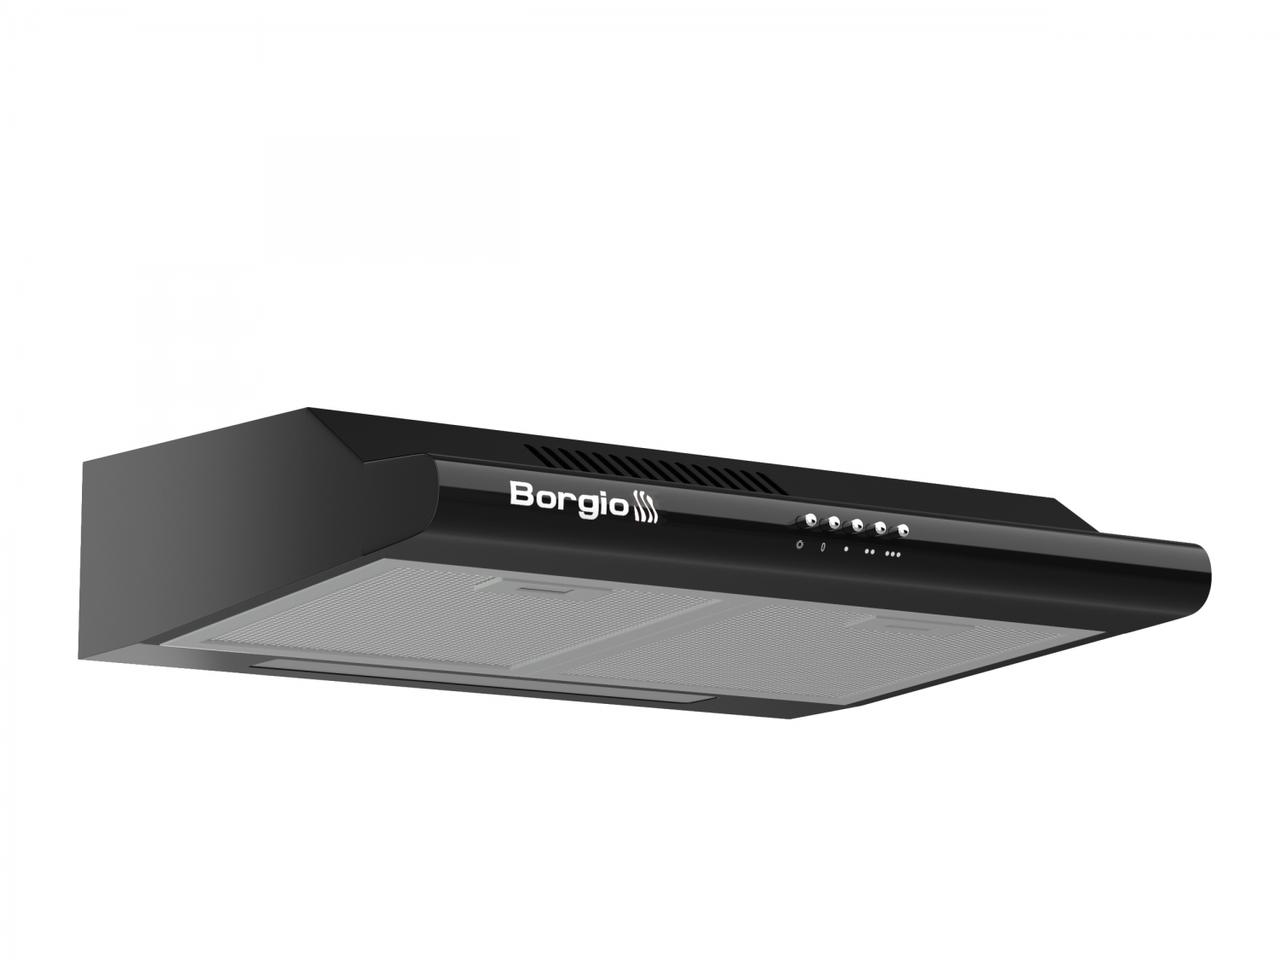 Кухонна витяжка плоска чорна BORGIO Gio 60 black